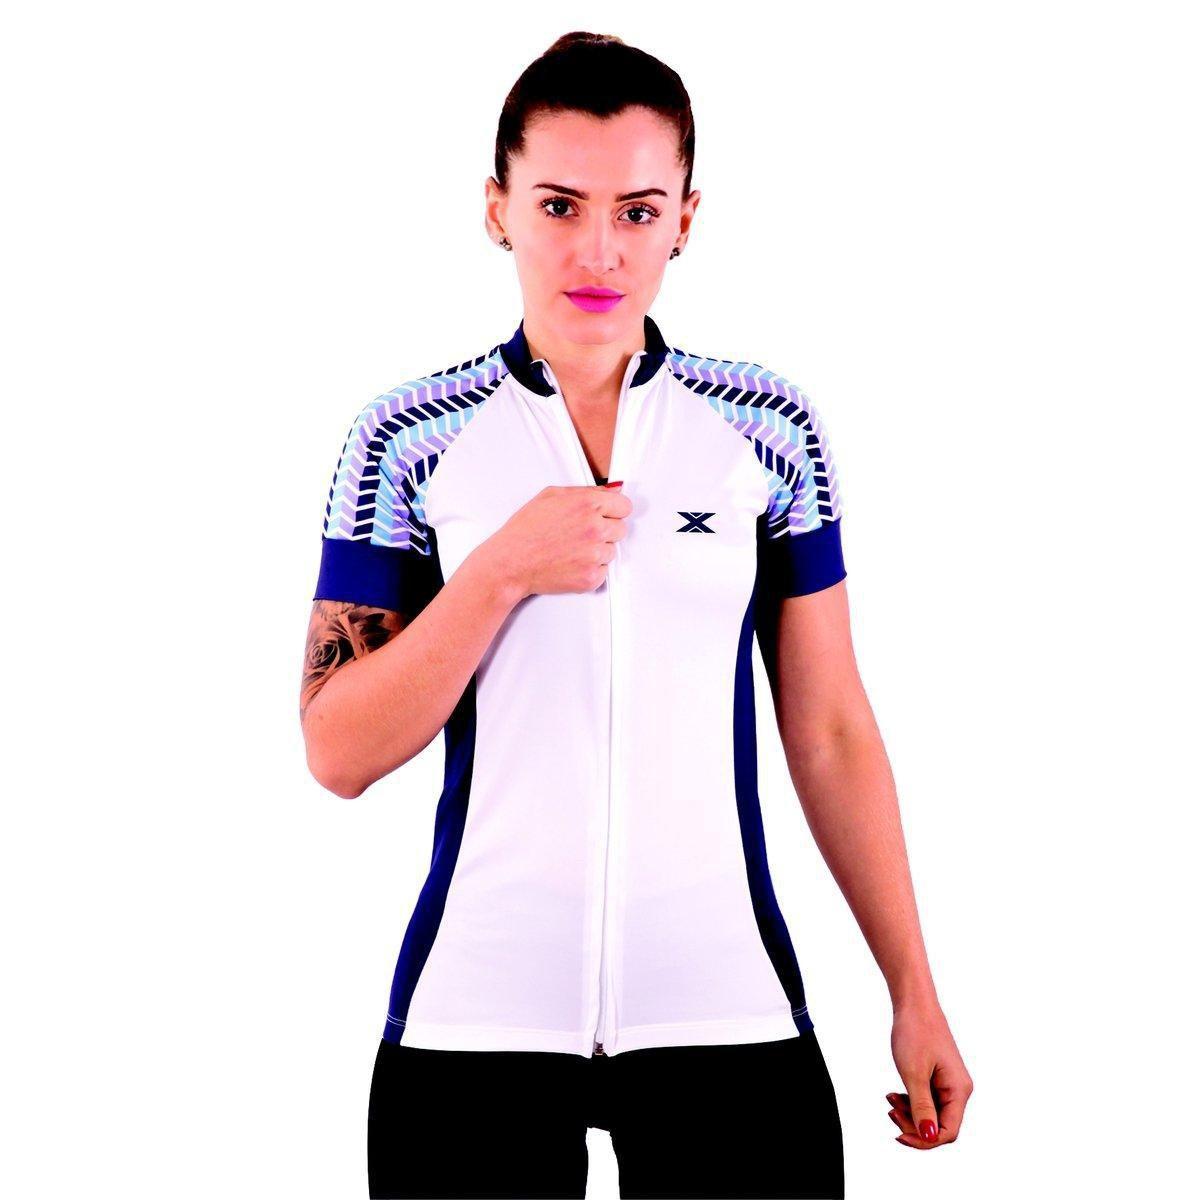 Ciclismo Branco Camisa 81011 XPOWER DX3 DX3 Feminina Camisa wqT60X